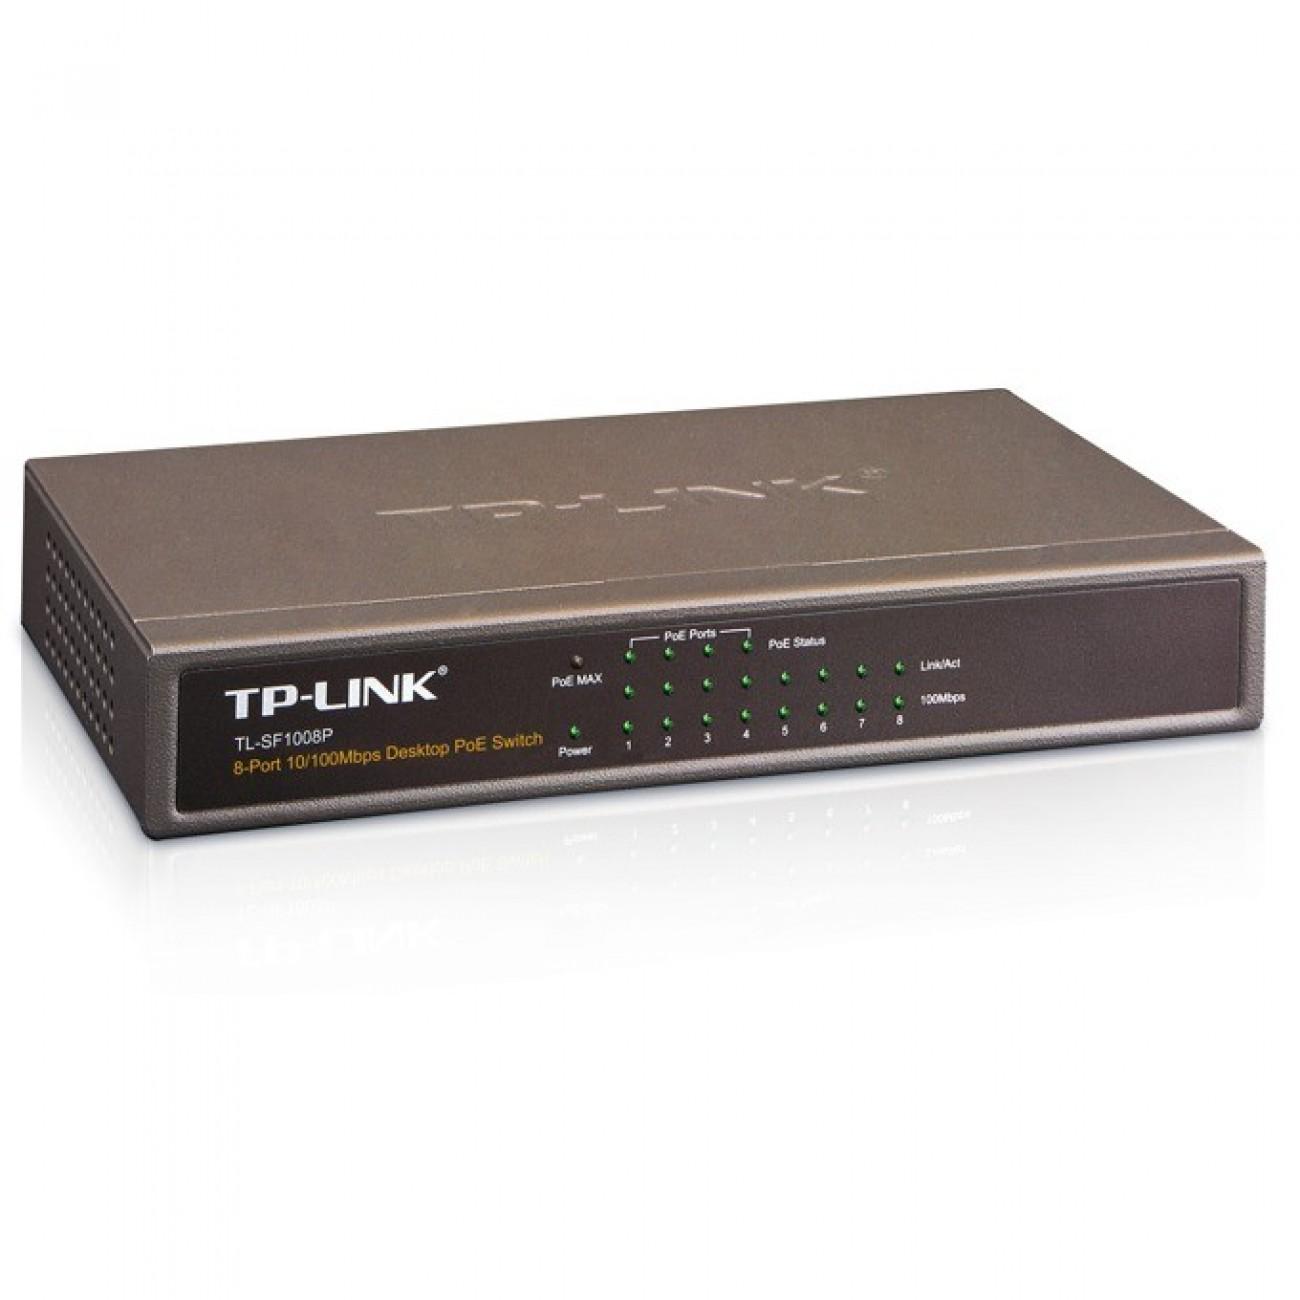 Switch TP-Link TL-SF1008P, 10/100Mbs 8Port, PoE в Суич -    Alleop